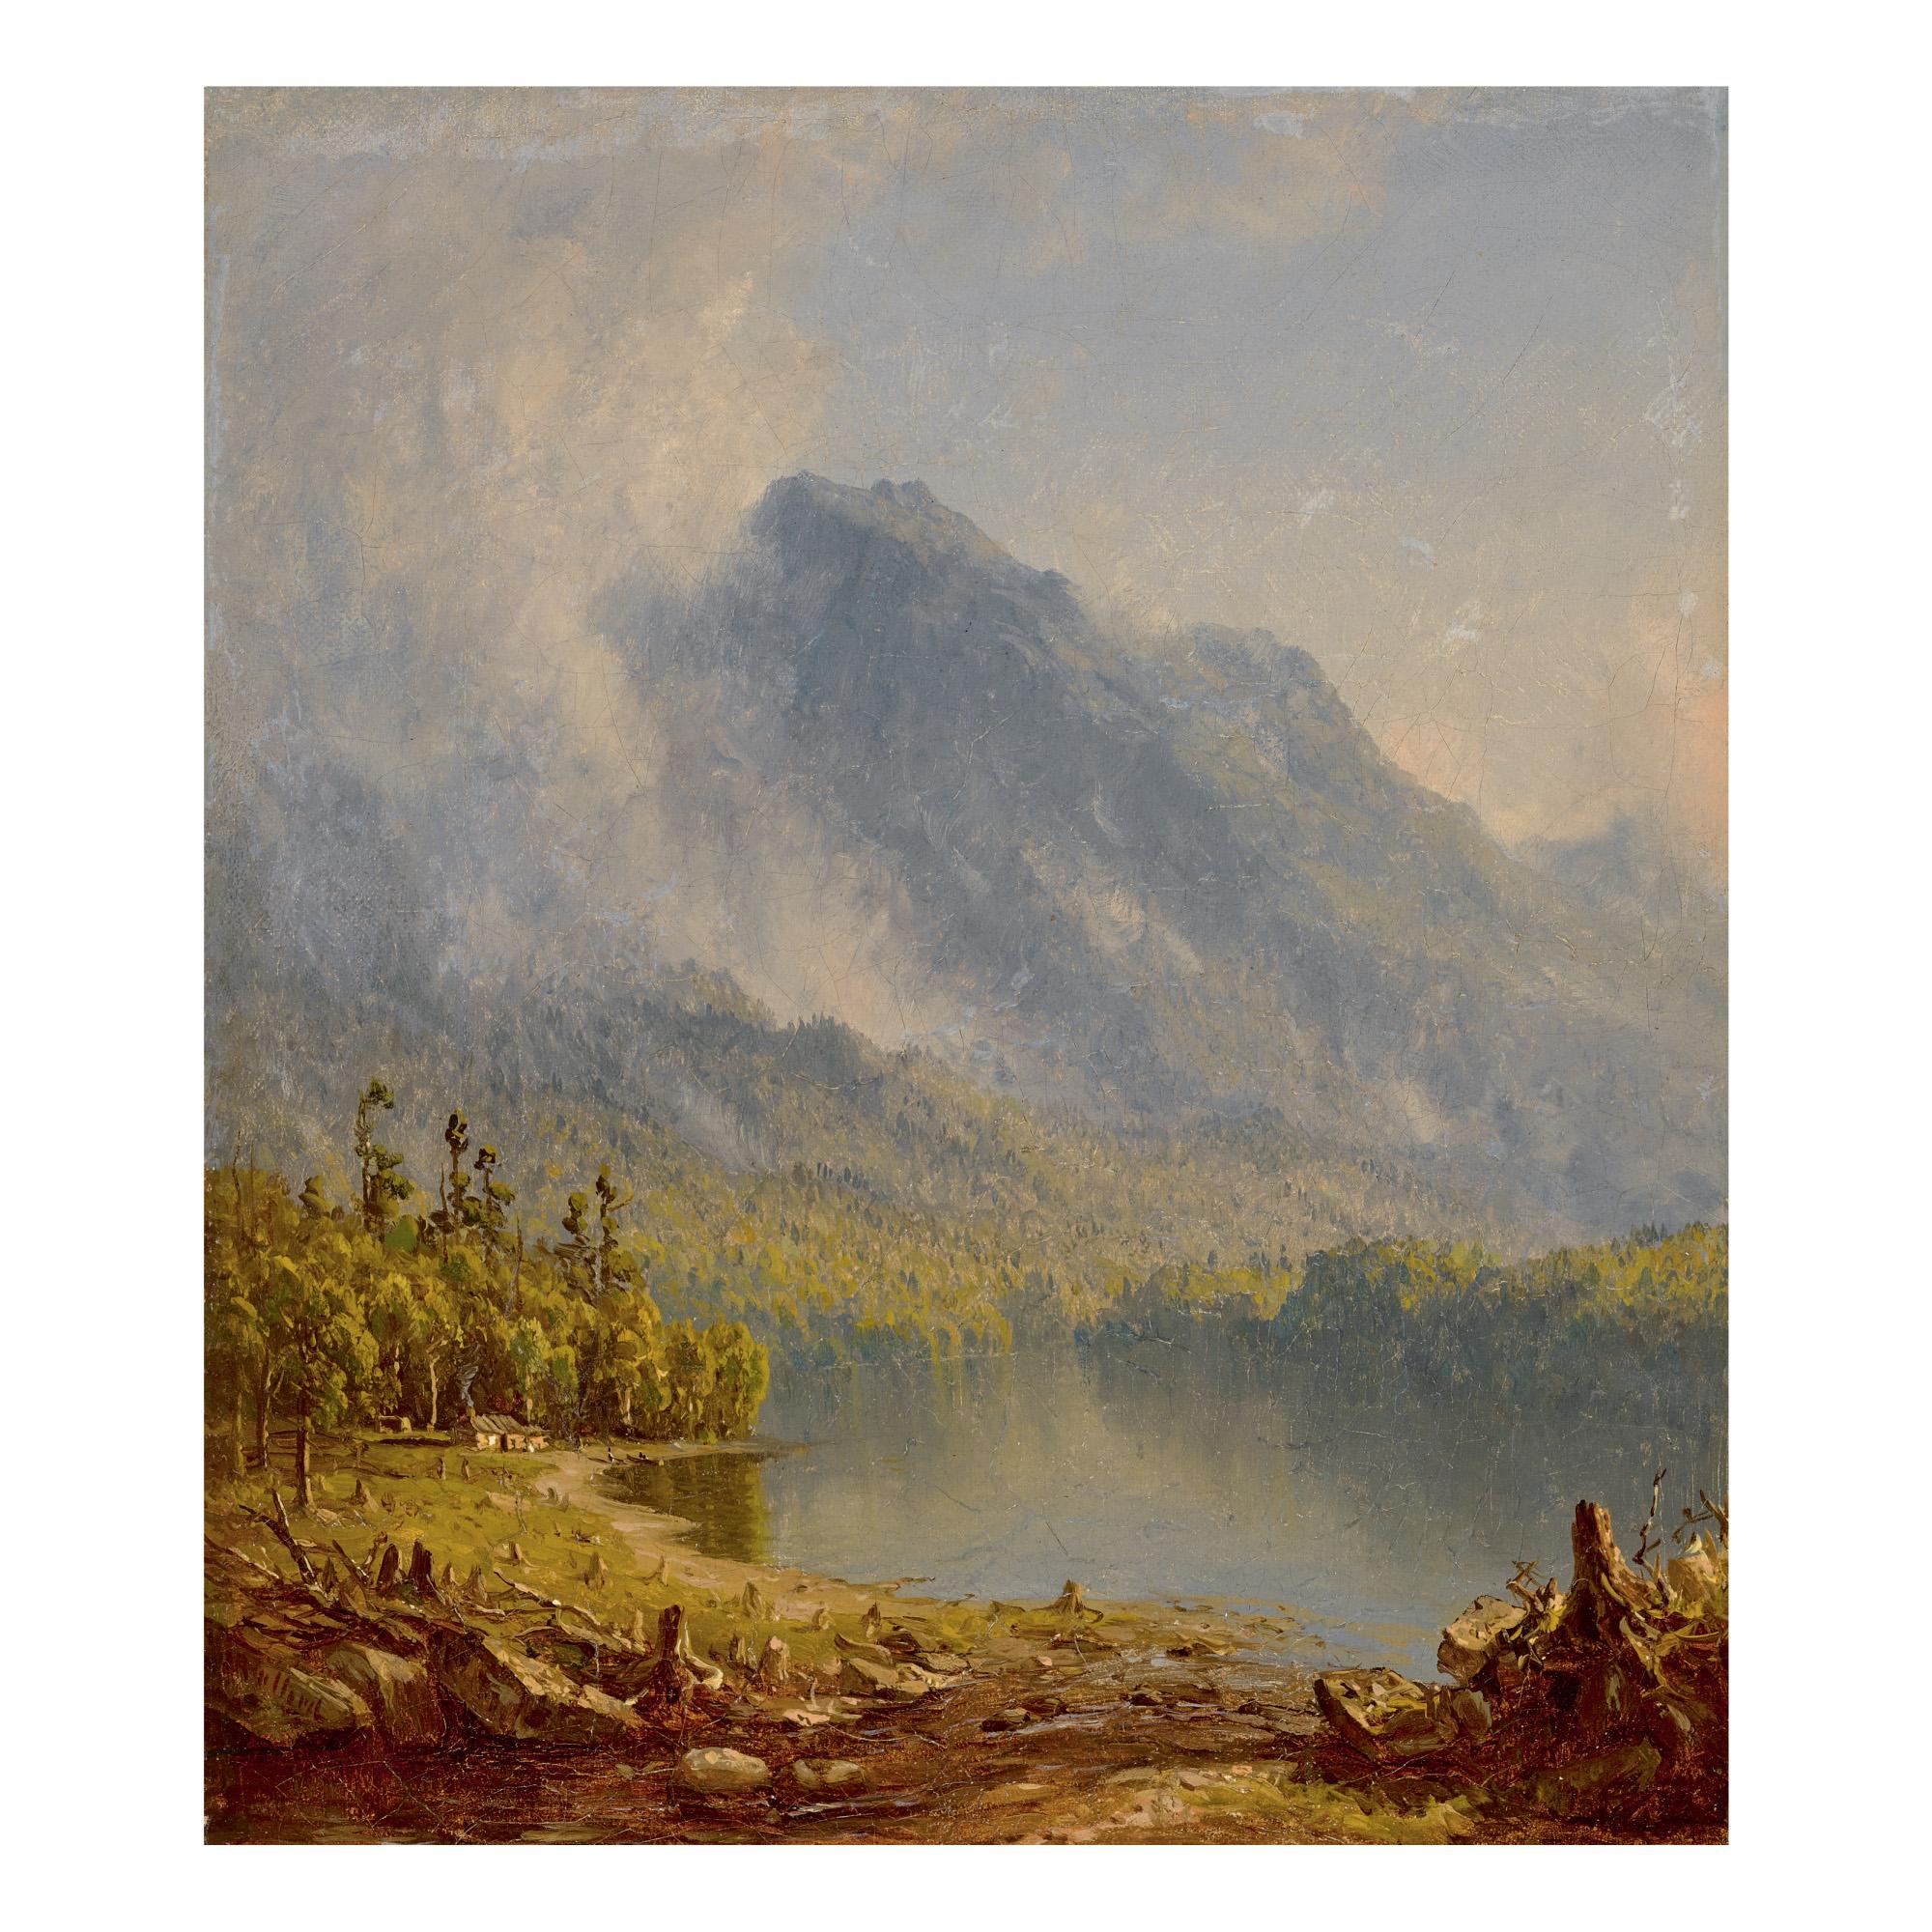 SANFORD ROBINSON GIFFORD | STUDY FOR 'MORNING IN THE ADIRONDACKS, 1867'